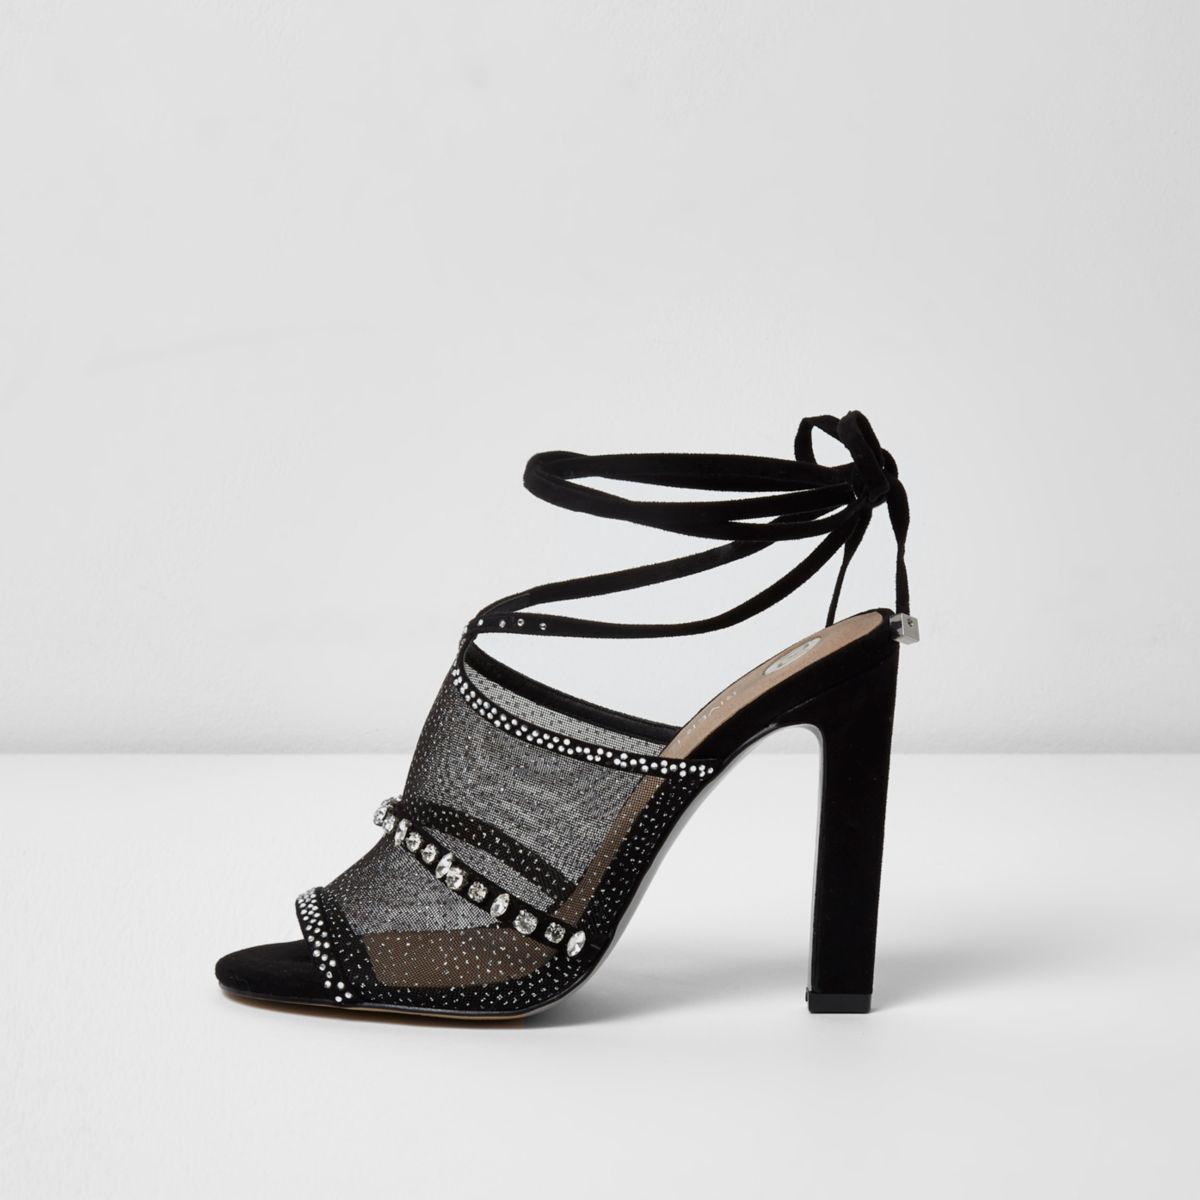 Zwarte sandalen met striksluiting en siersteentjes